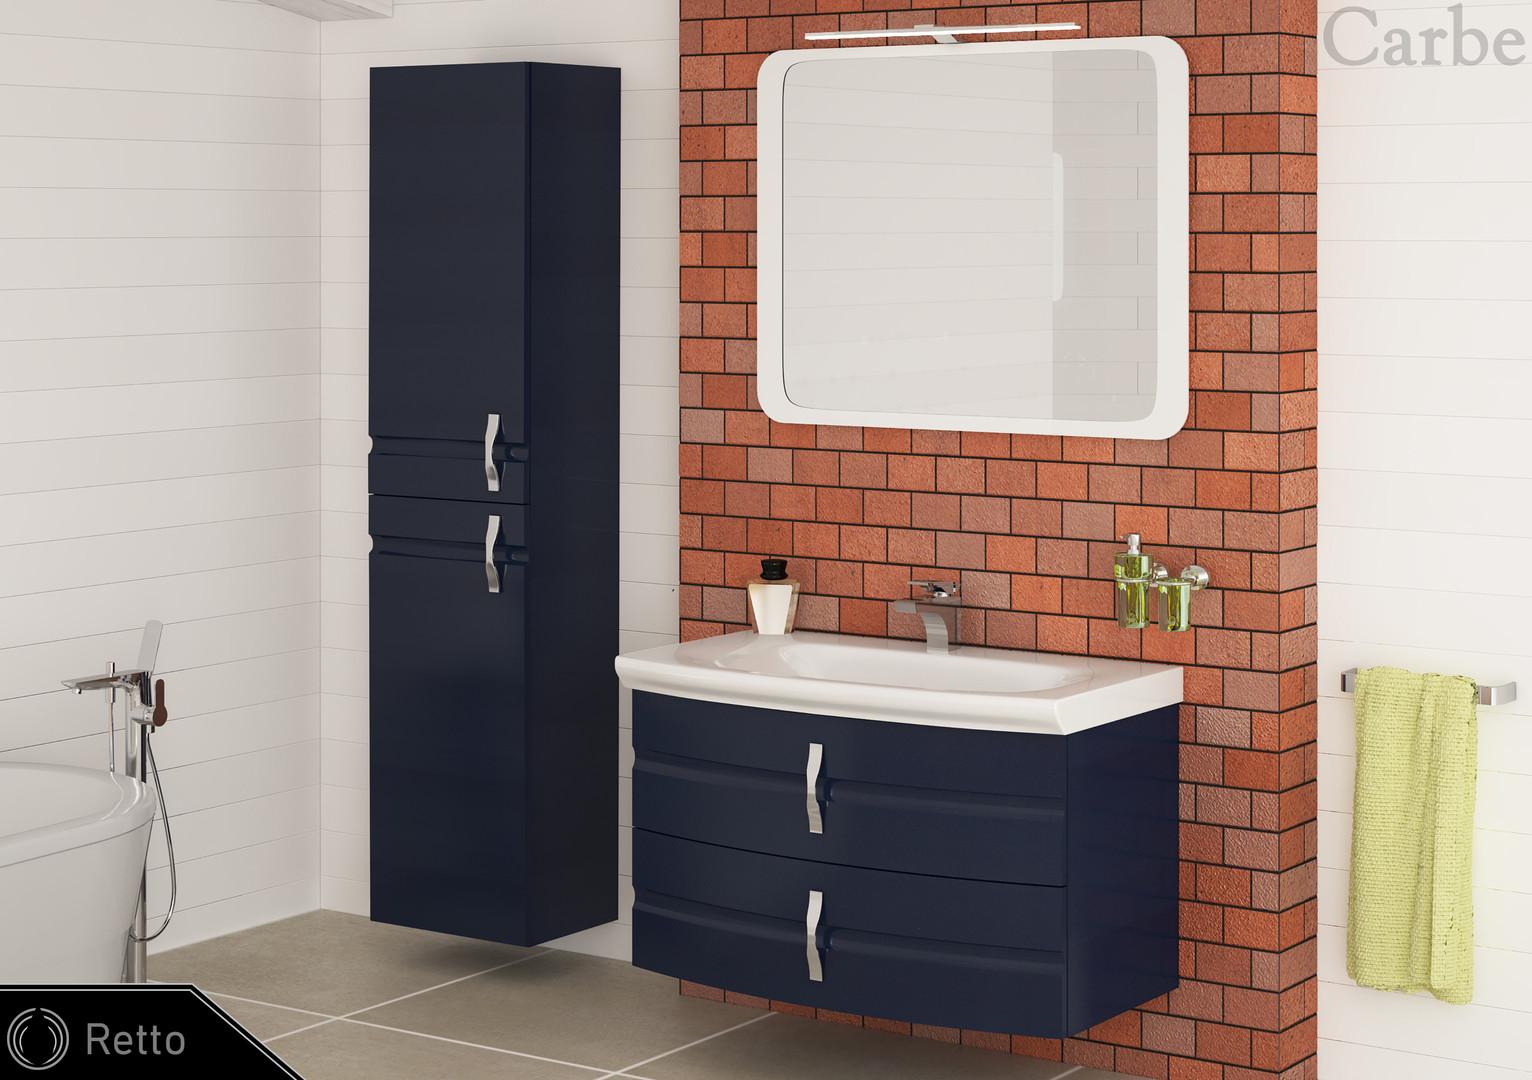 Retto - Night Blue, Ceramic Washbasin, Soft Closing